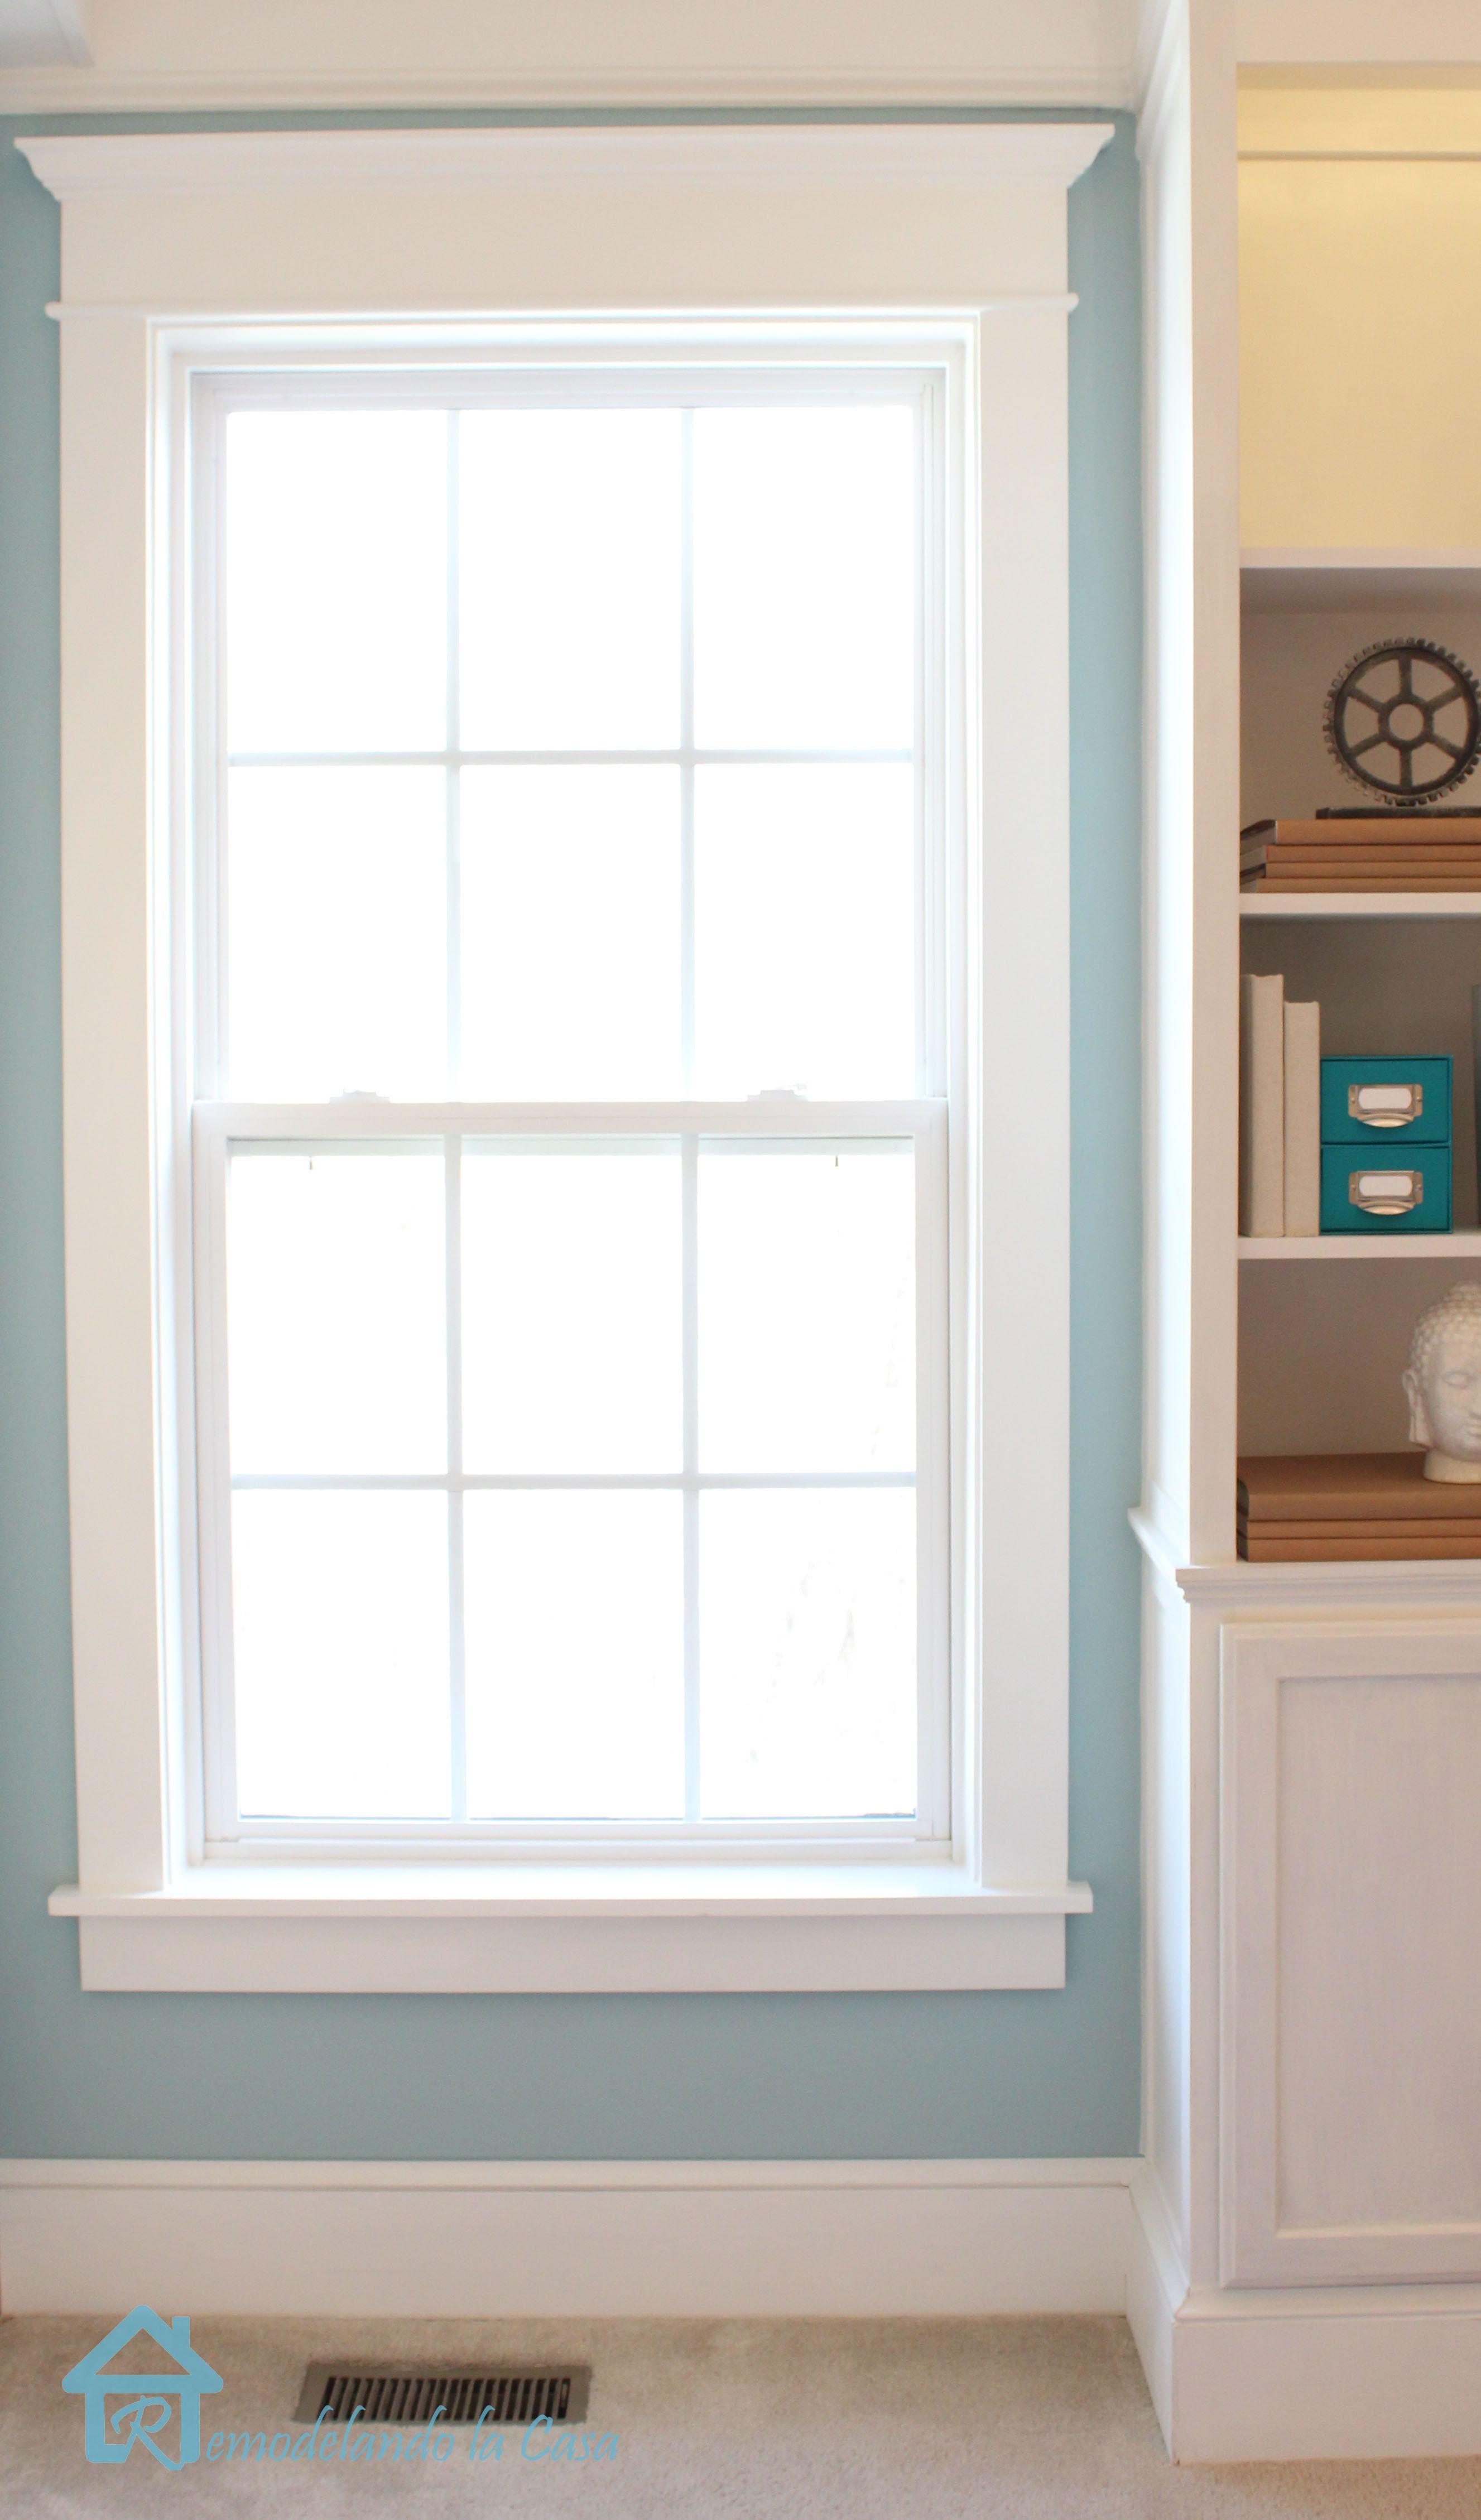 Window casing ideas  how to install window trim  georgeus room  pinterest  hogar